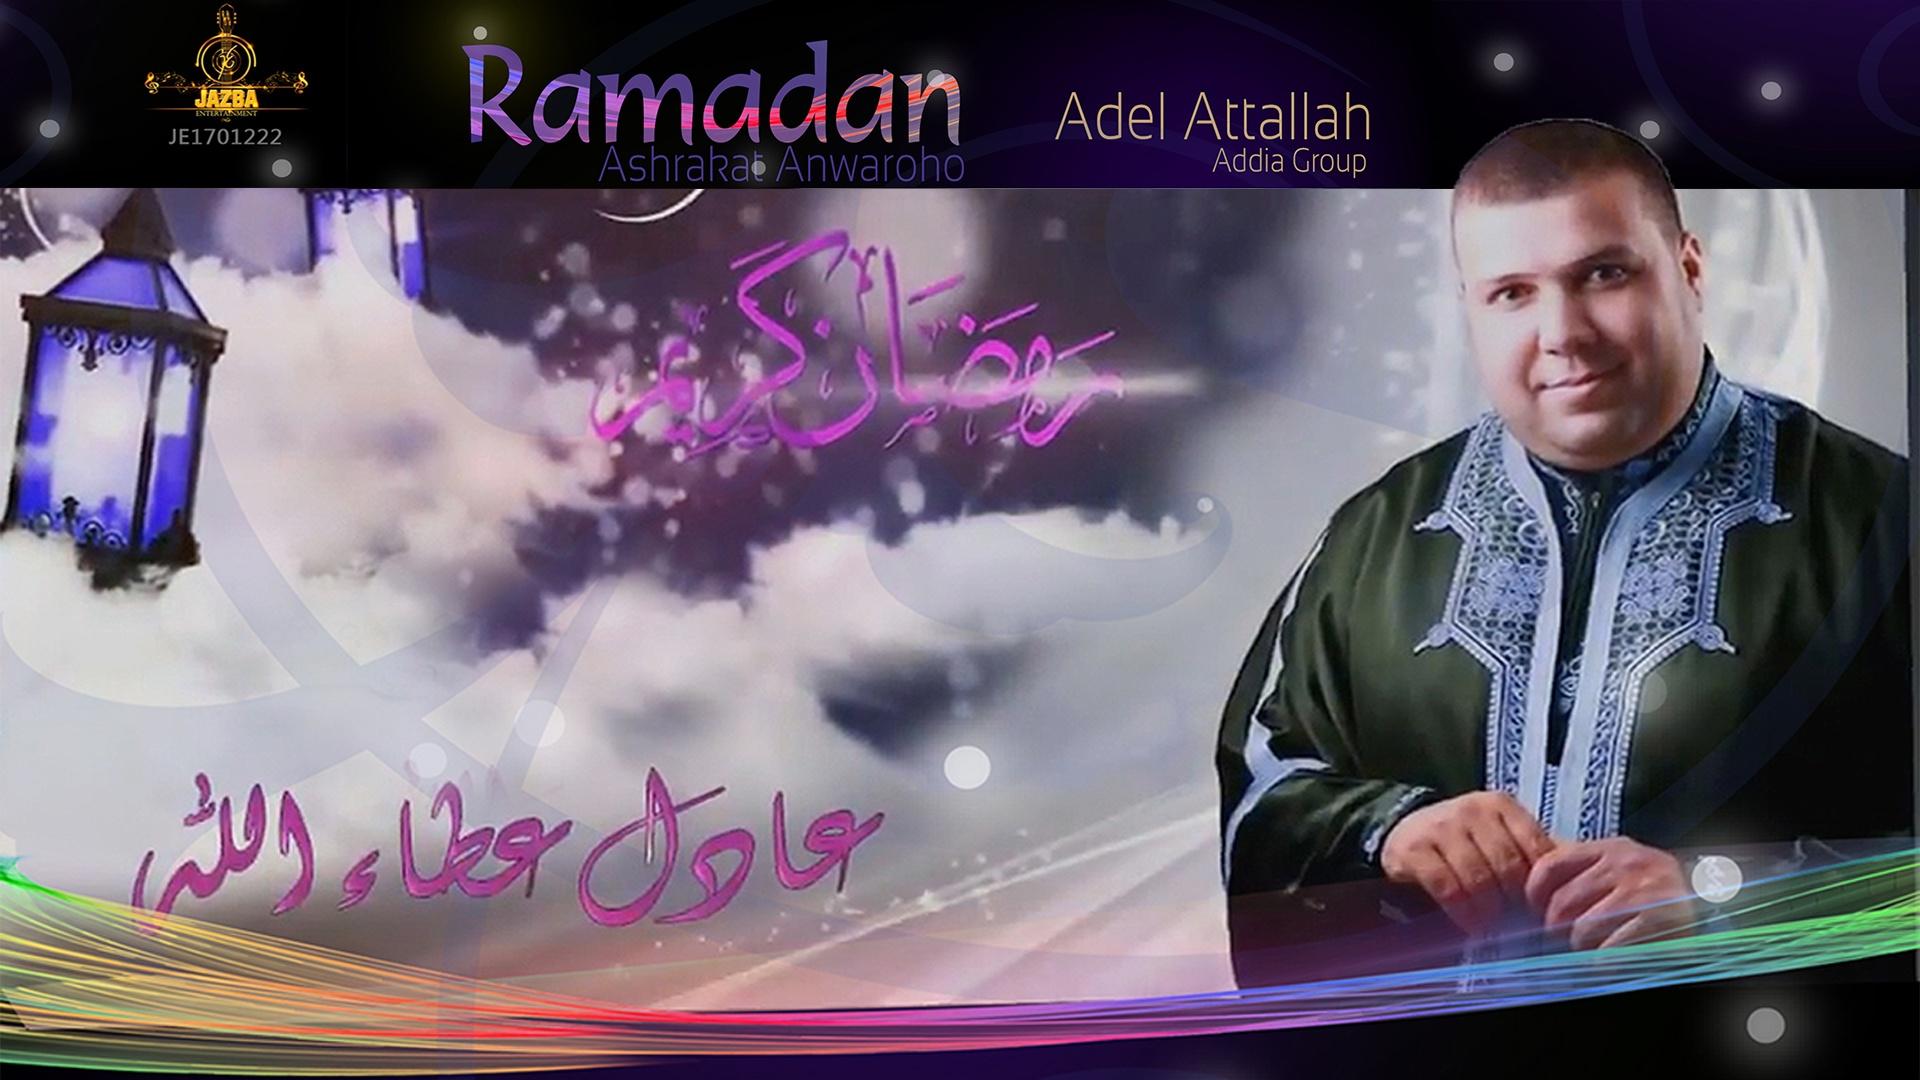 Ramadan Ashrakat Anwaroho by Adel Attallah [Addia Group